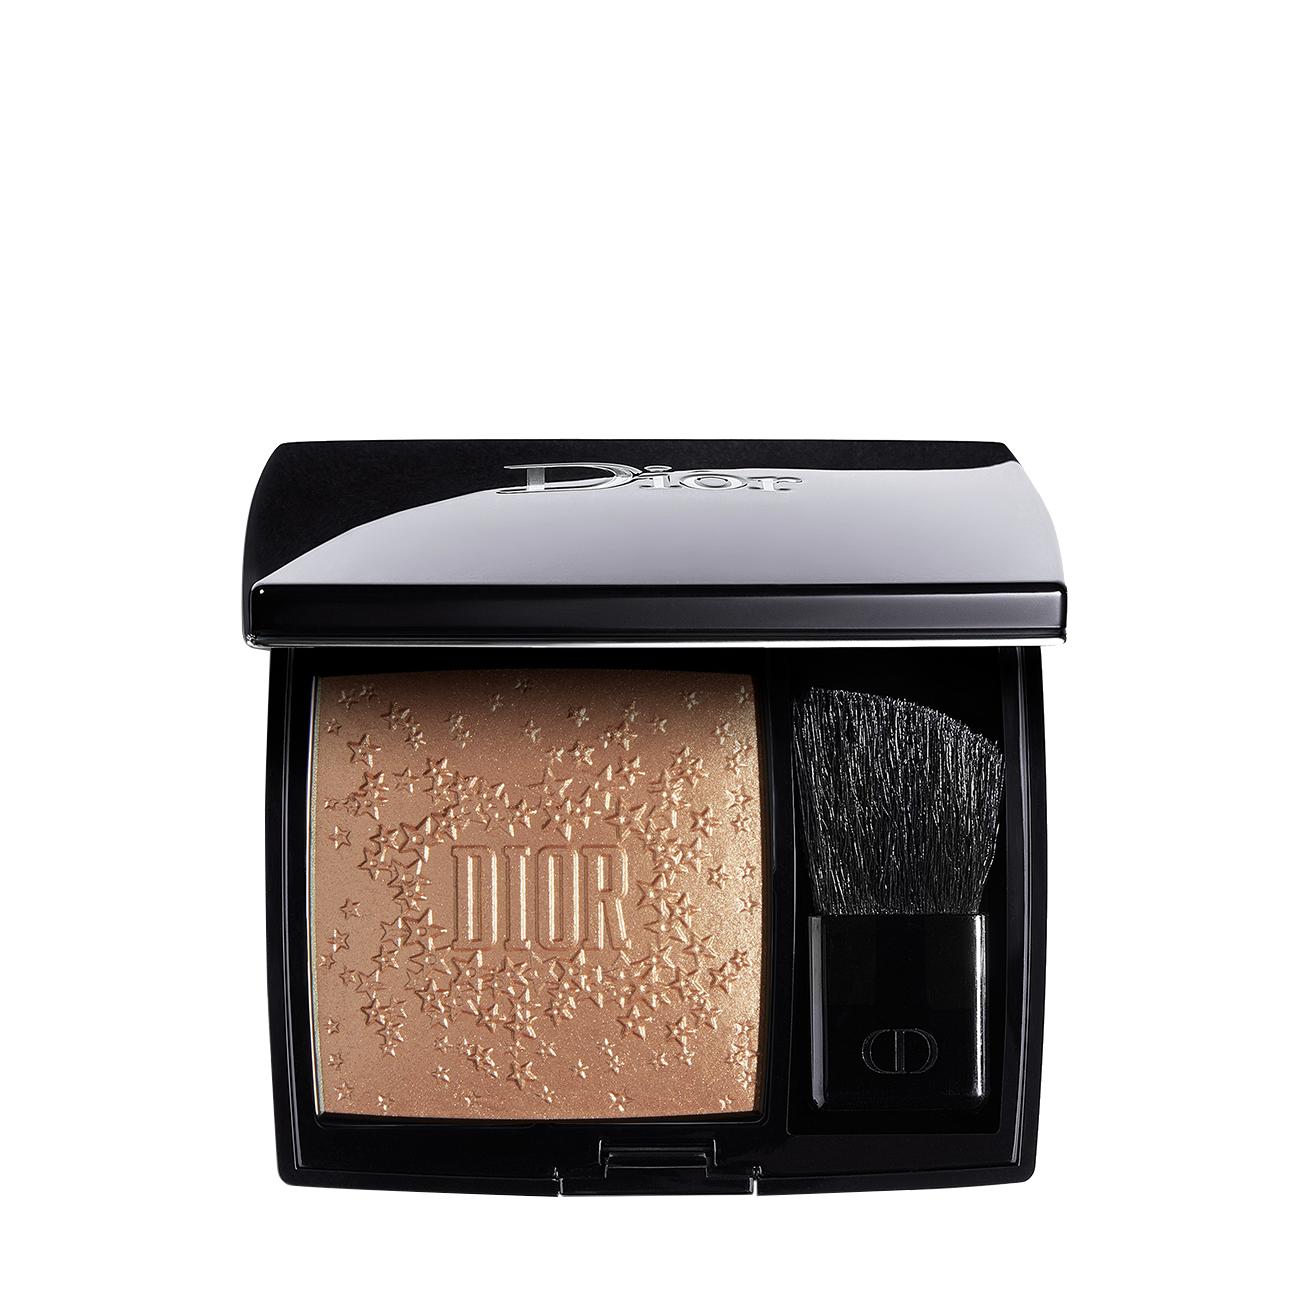 Rouge Blush 6.7gr Golden 001 Dior imagine 2021 bestvalue.eu